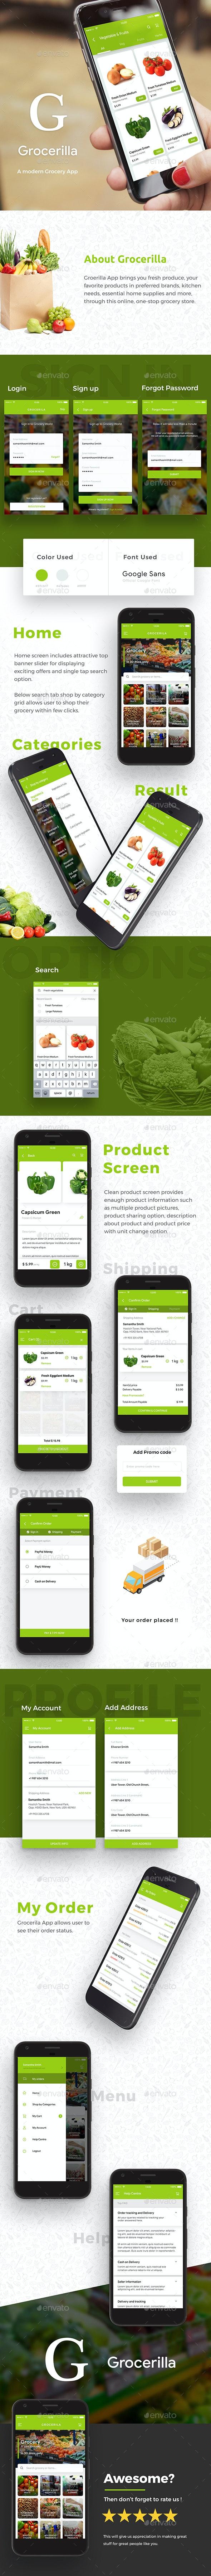 Grocery App UI Kit  |  Grocerilla - User Interfaces Web Elements